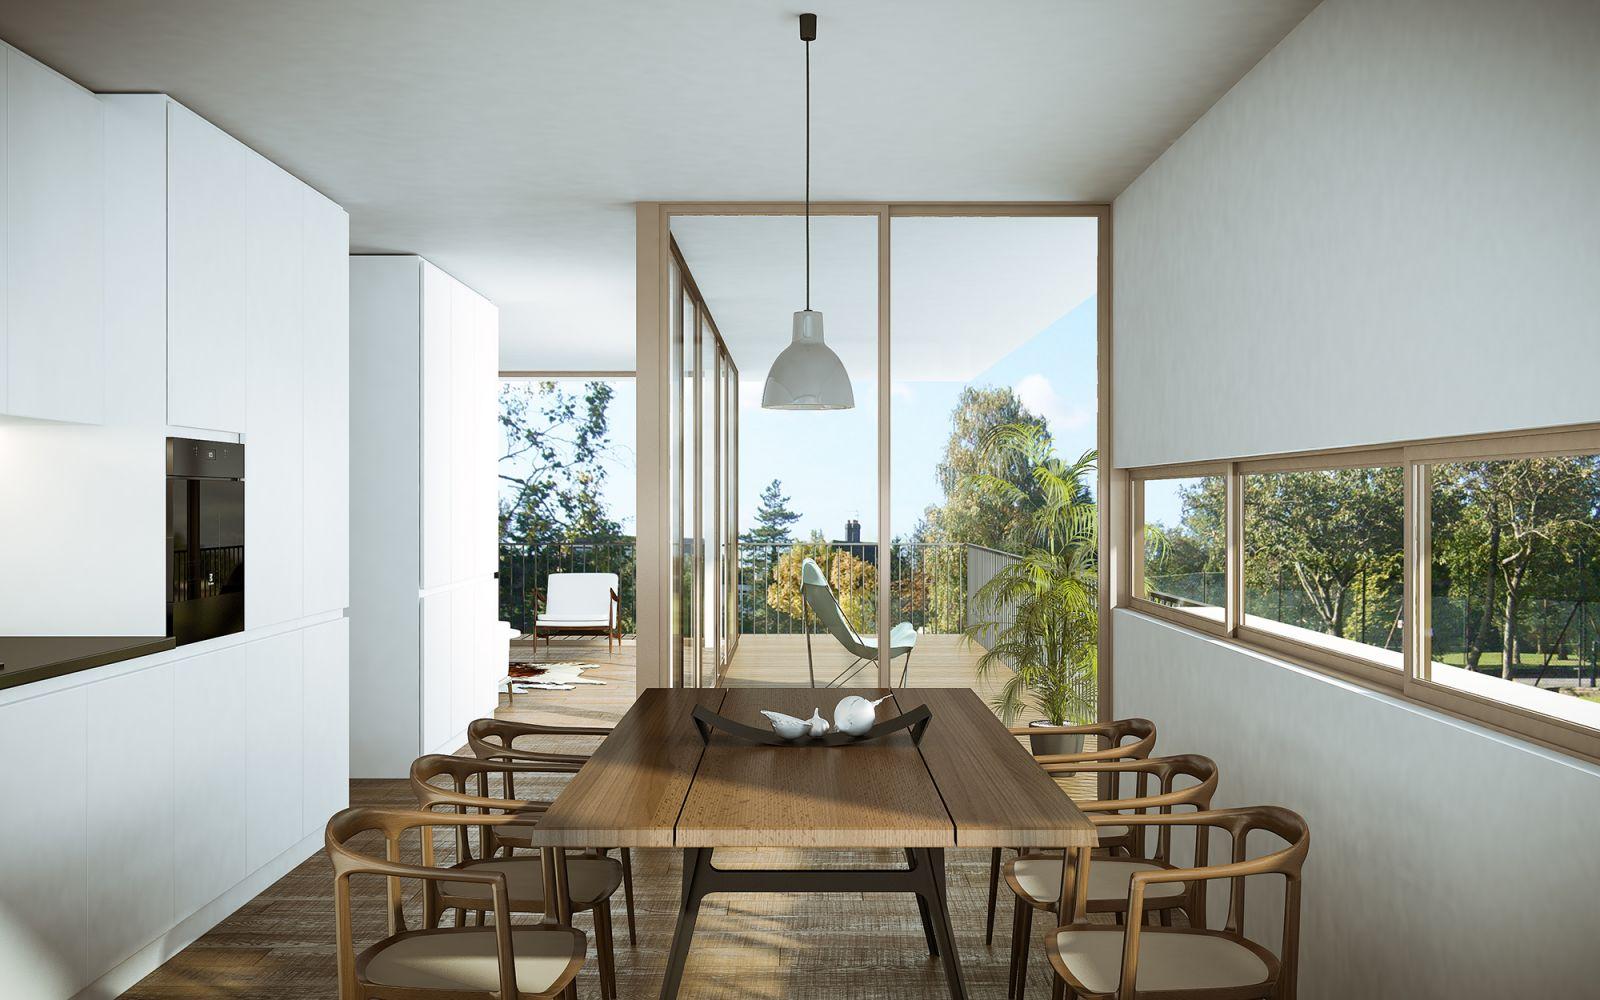 Le Vallon de Villars - Apartments 240